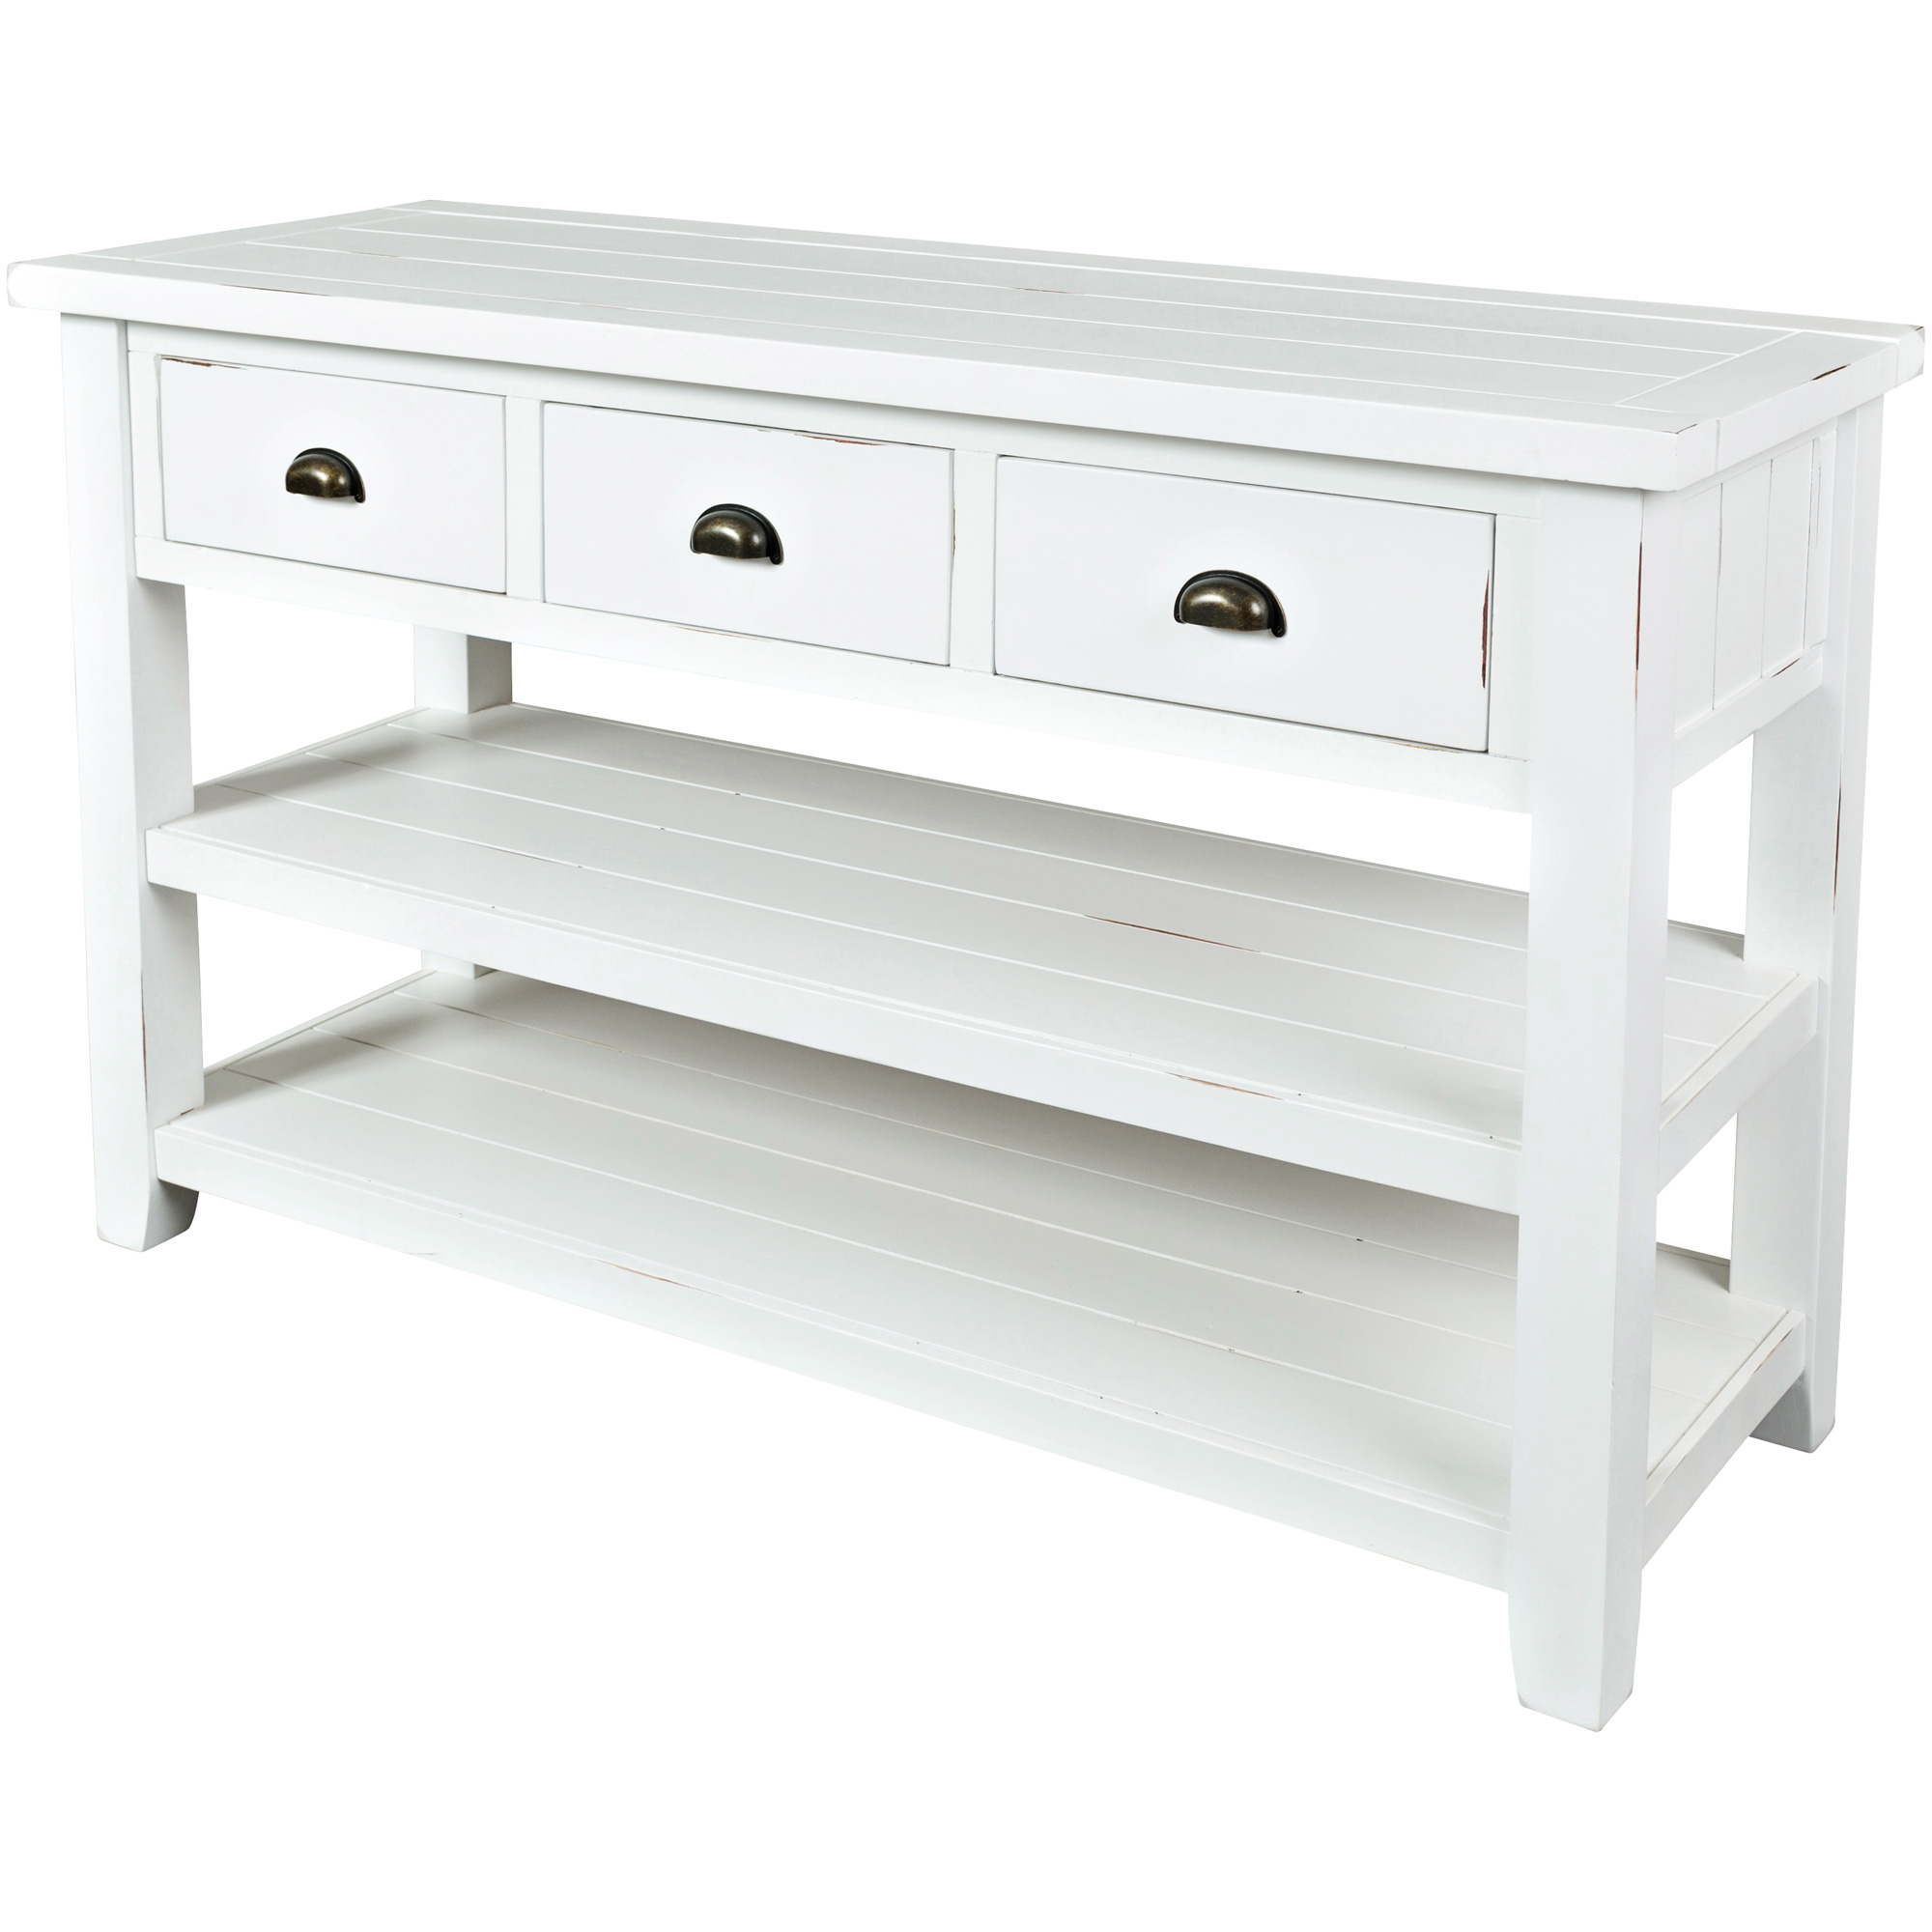 Jofran | Artisans Craft White Console Table